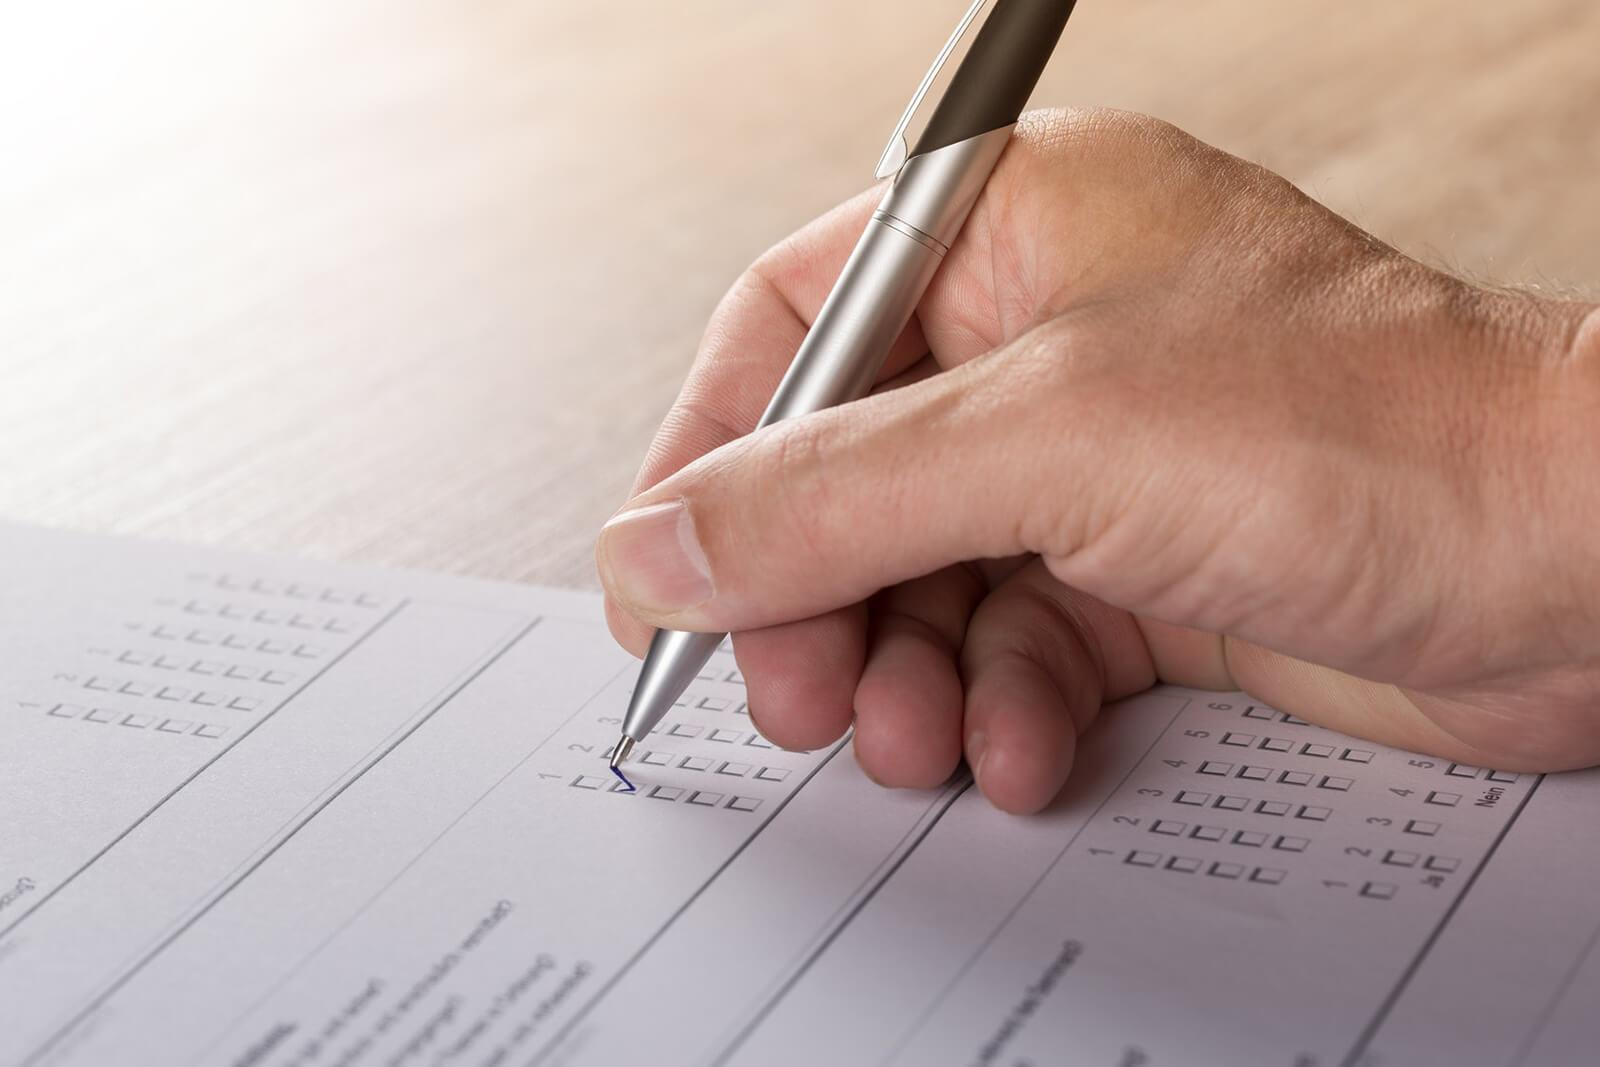 Statement On Certification Exam Reform Landscape Ontario